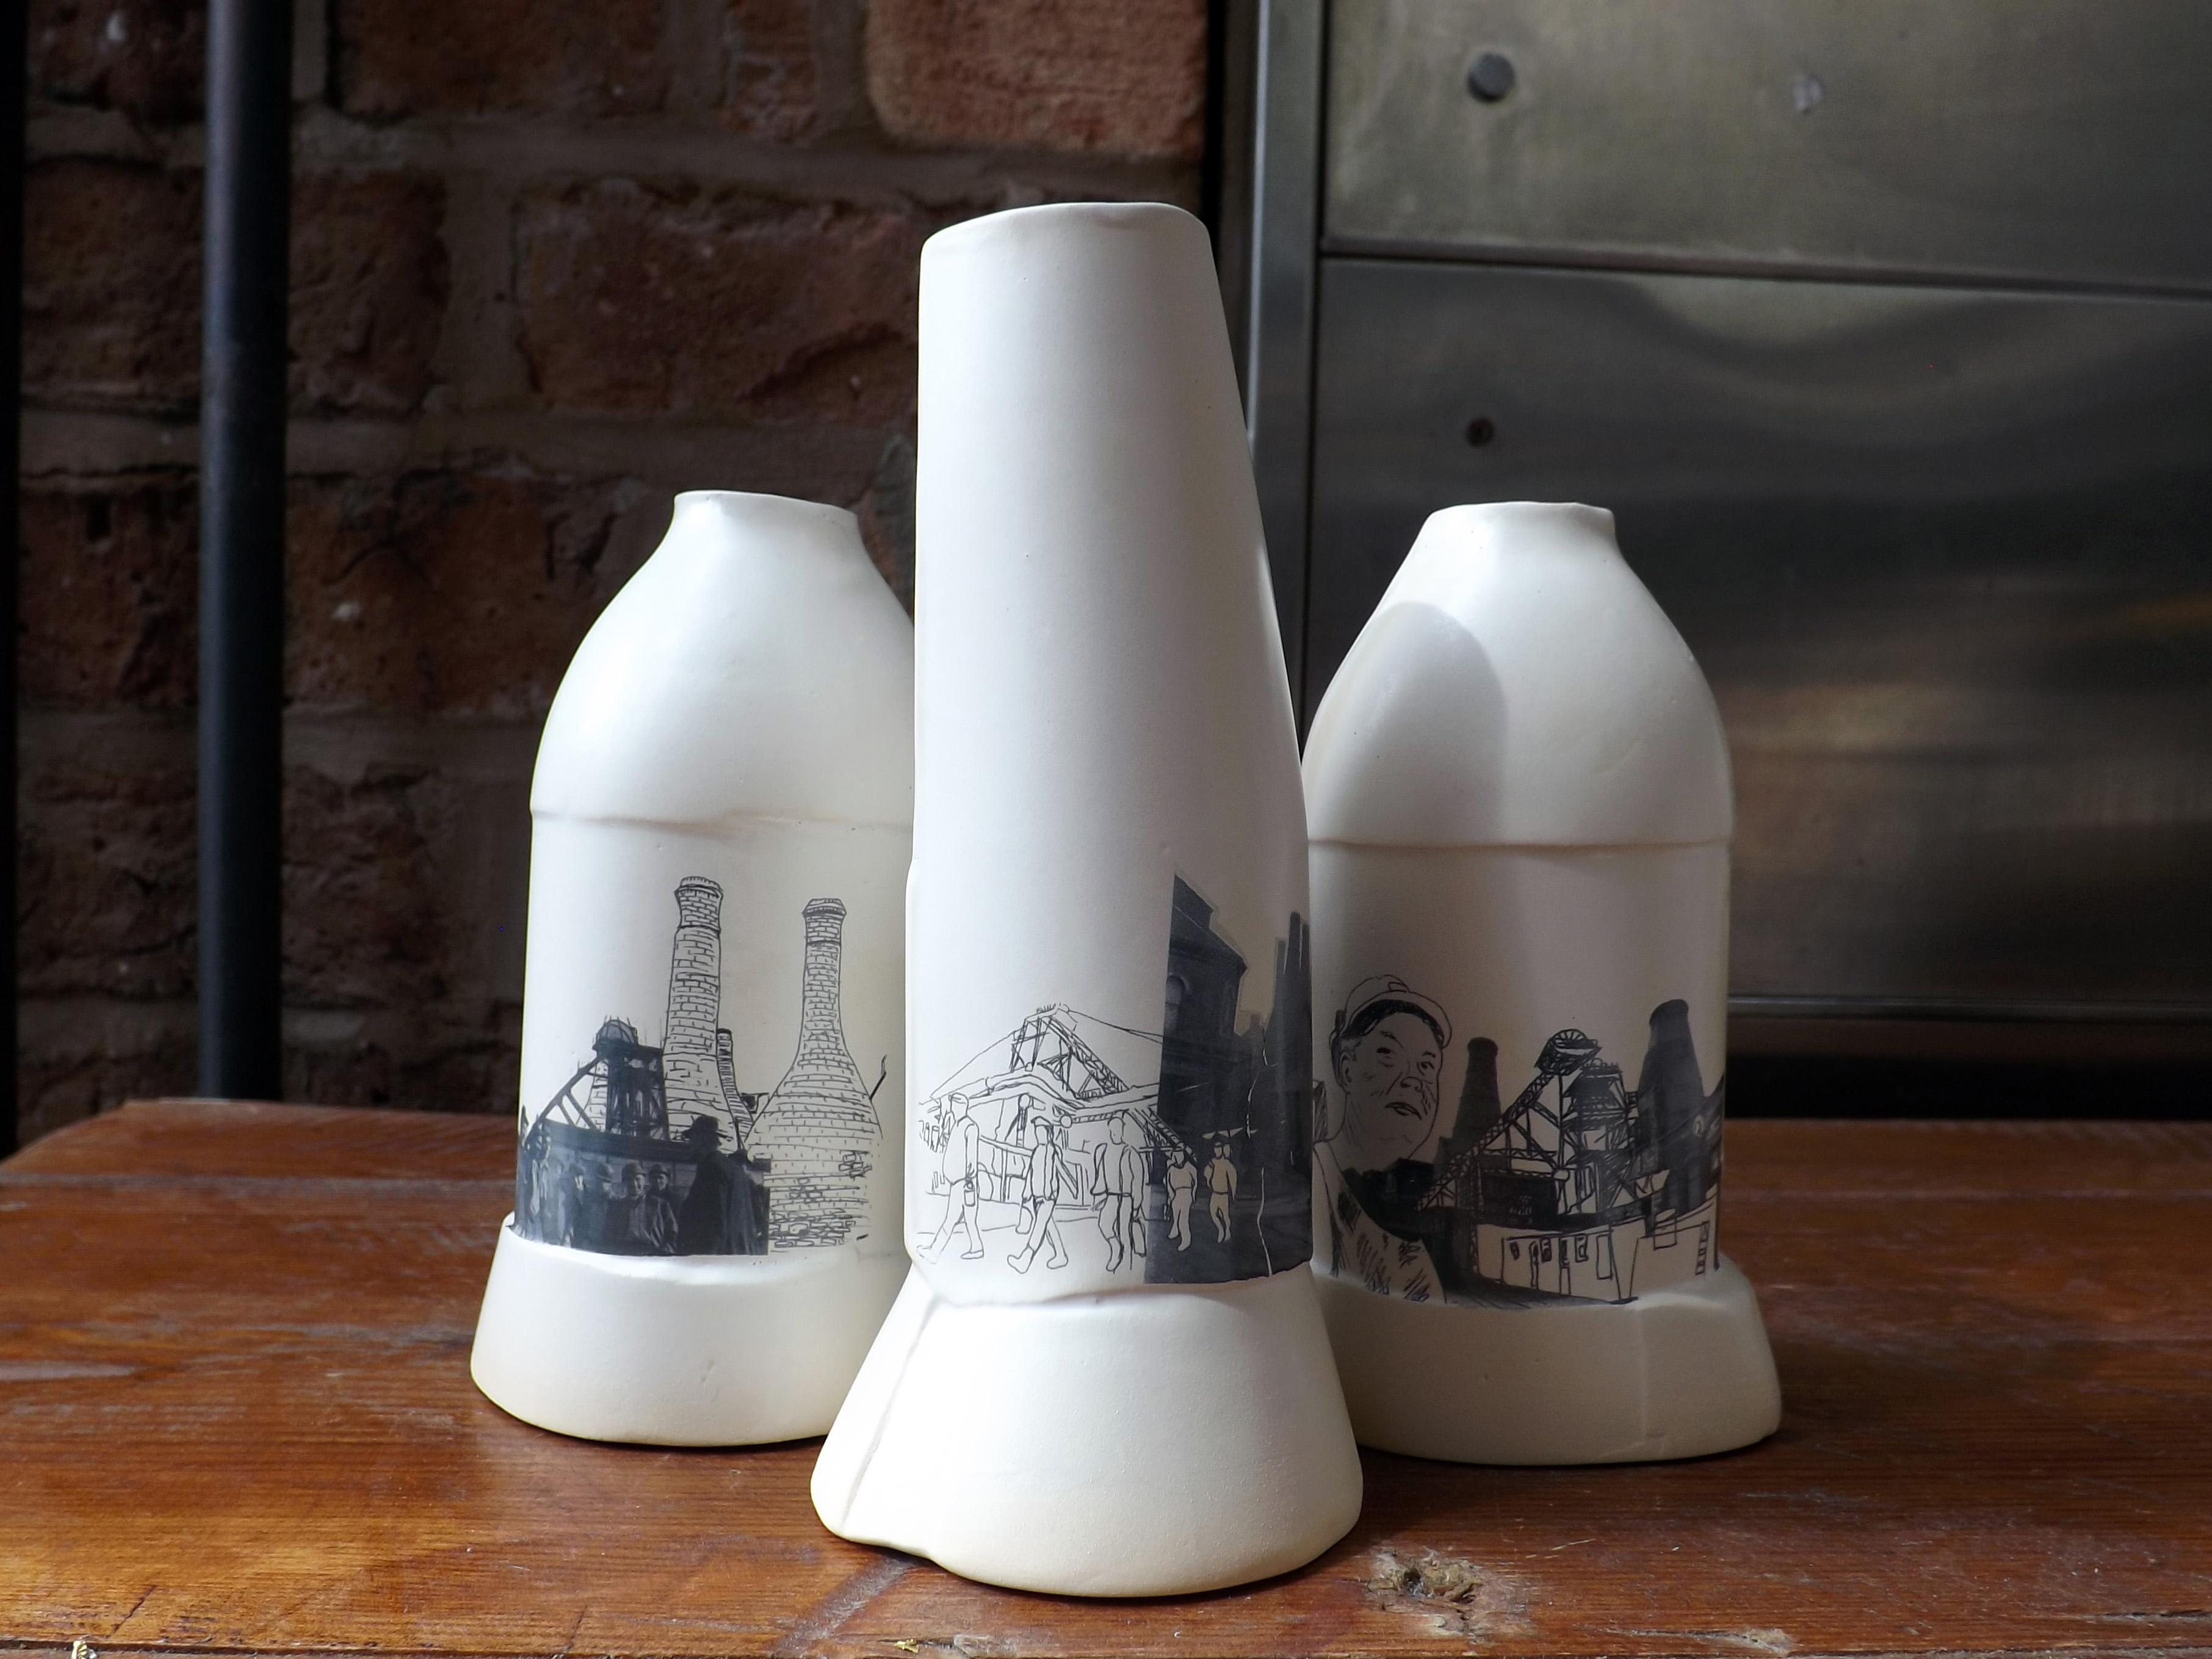 10 Ceramic vessels Stoke-on-Trent